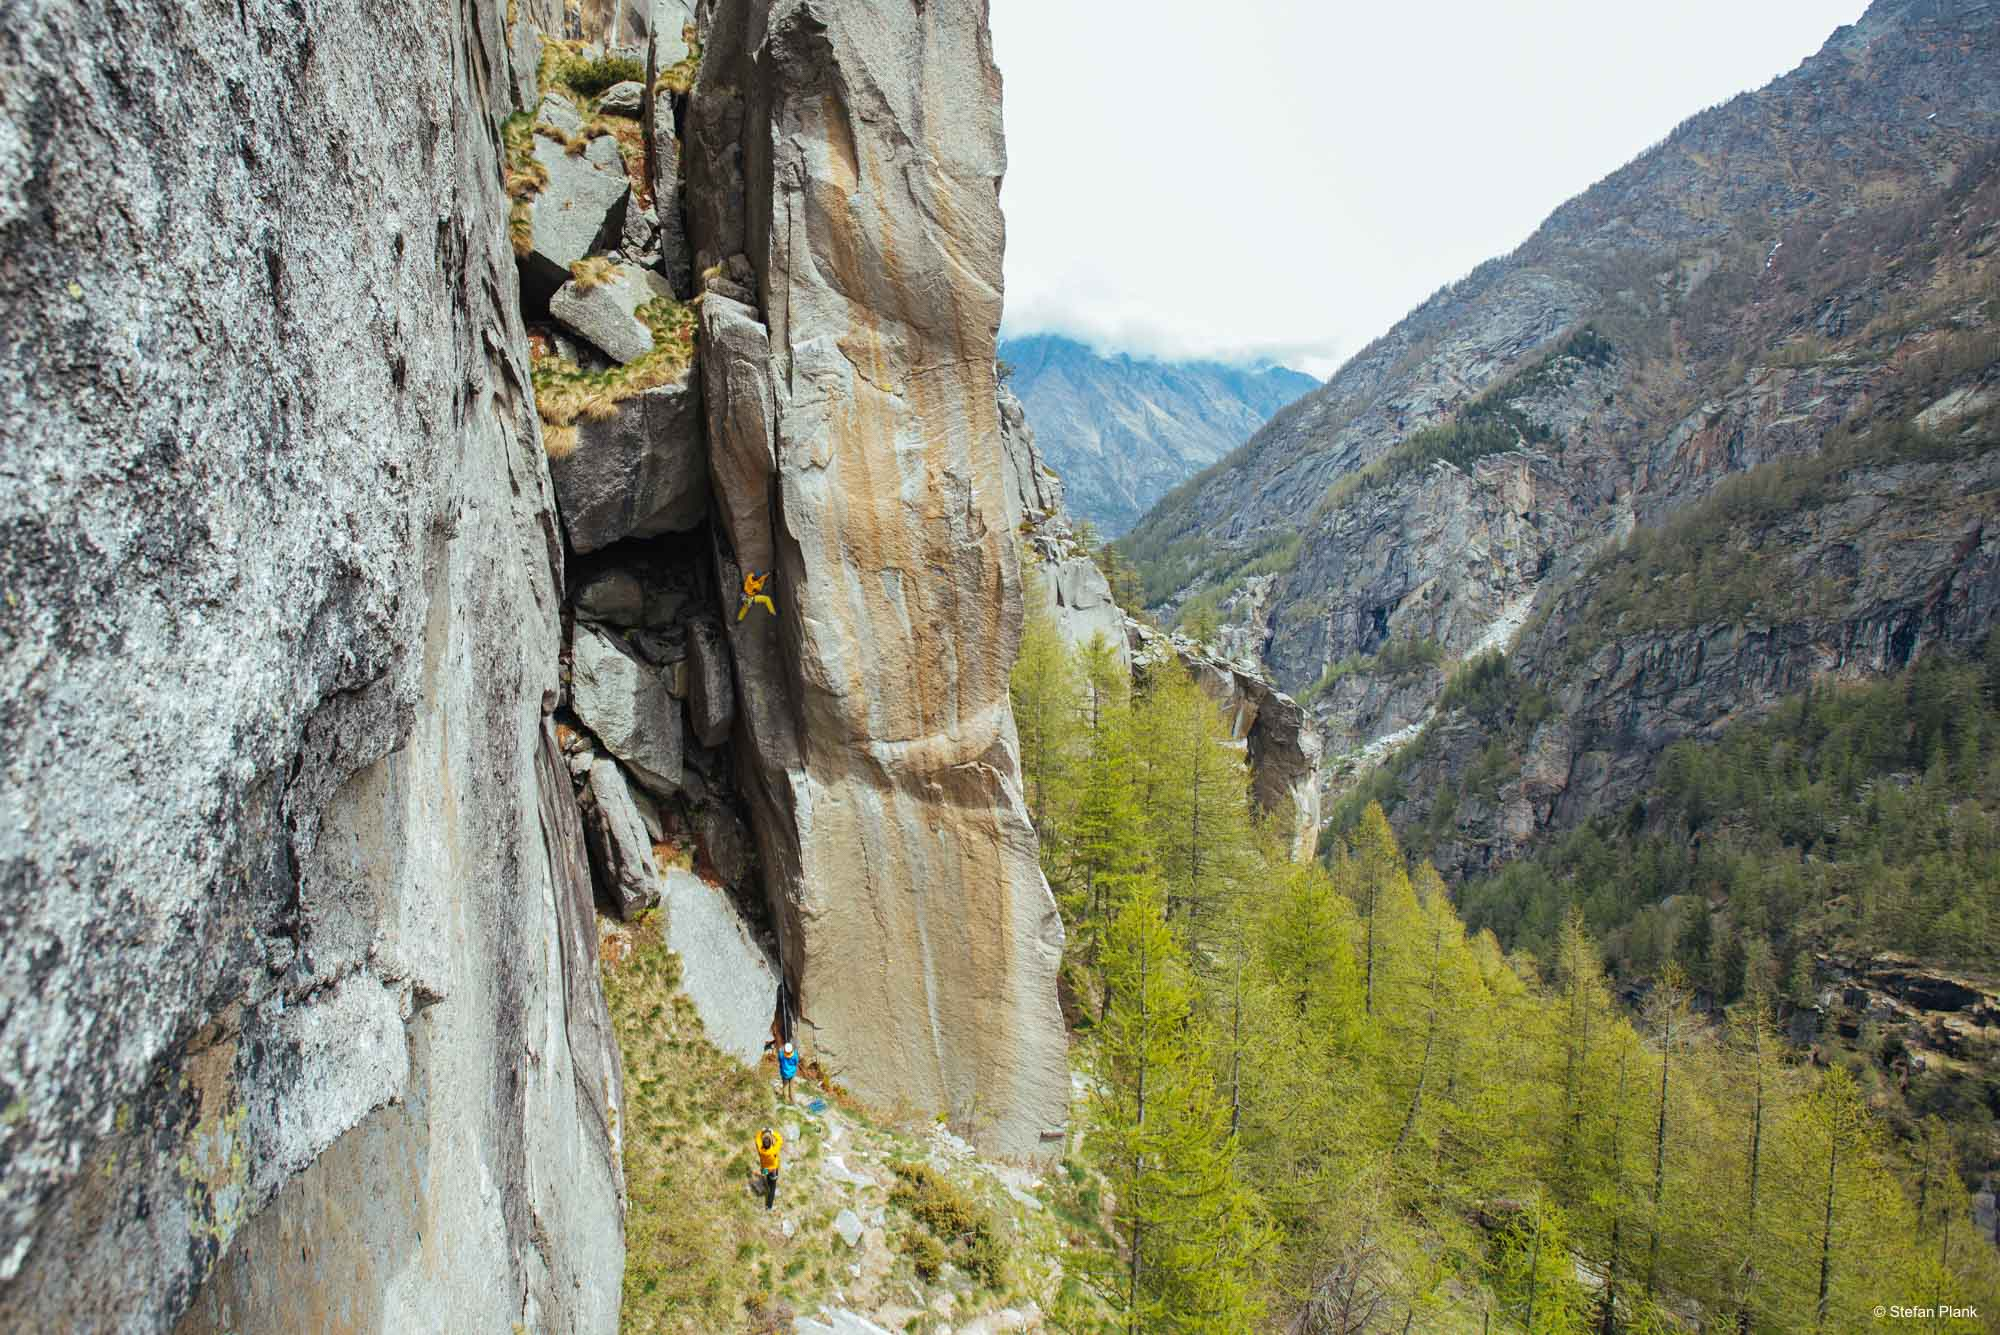 ALPINIST: Rissklettern im Valle del Orco